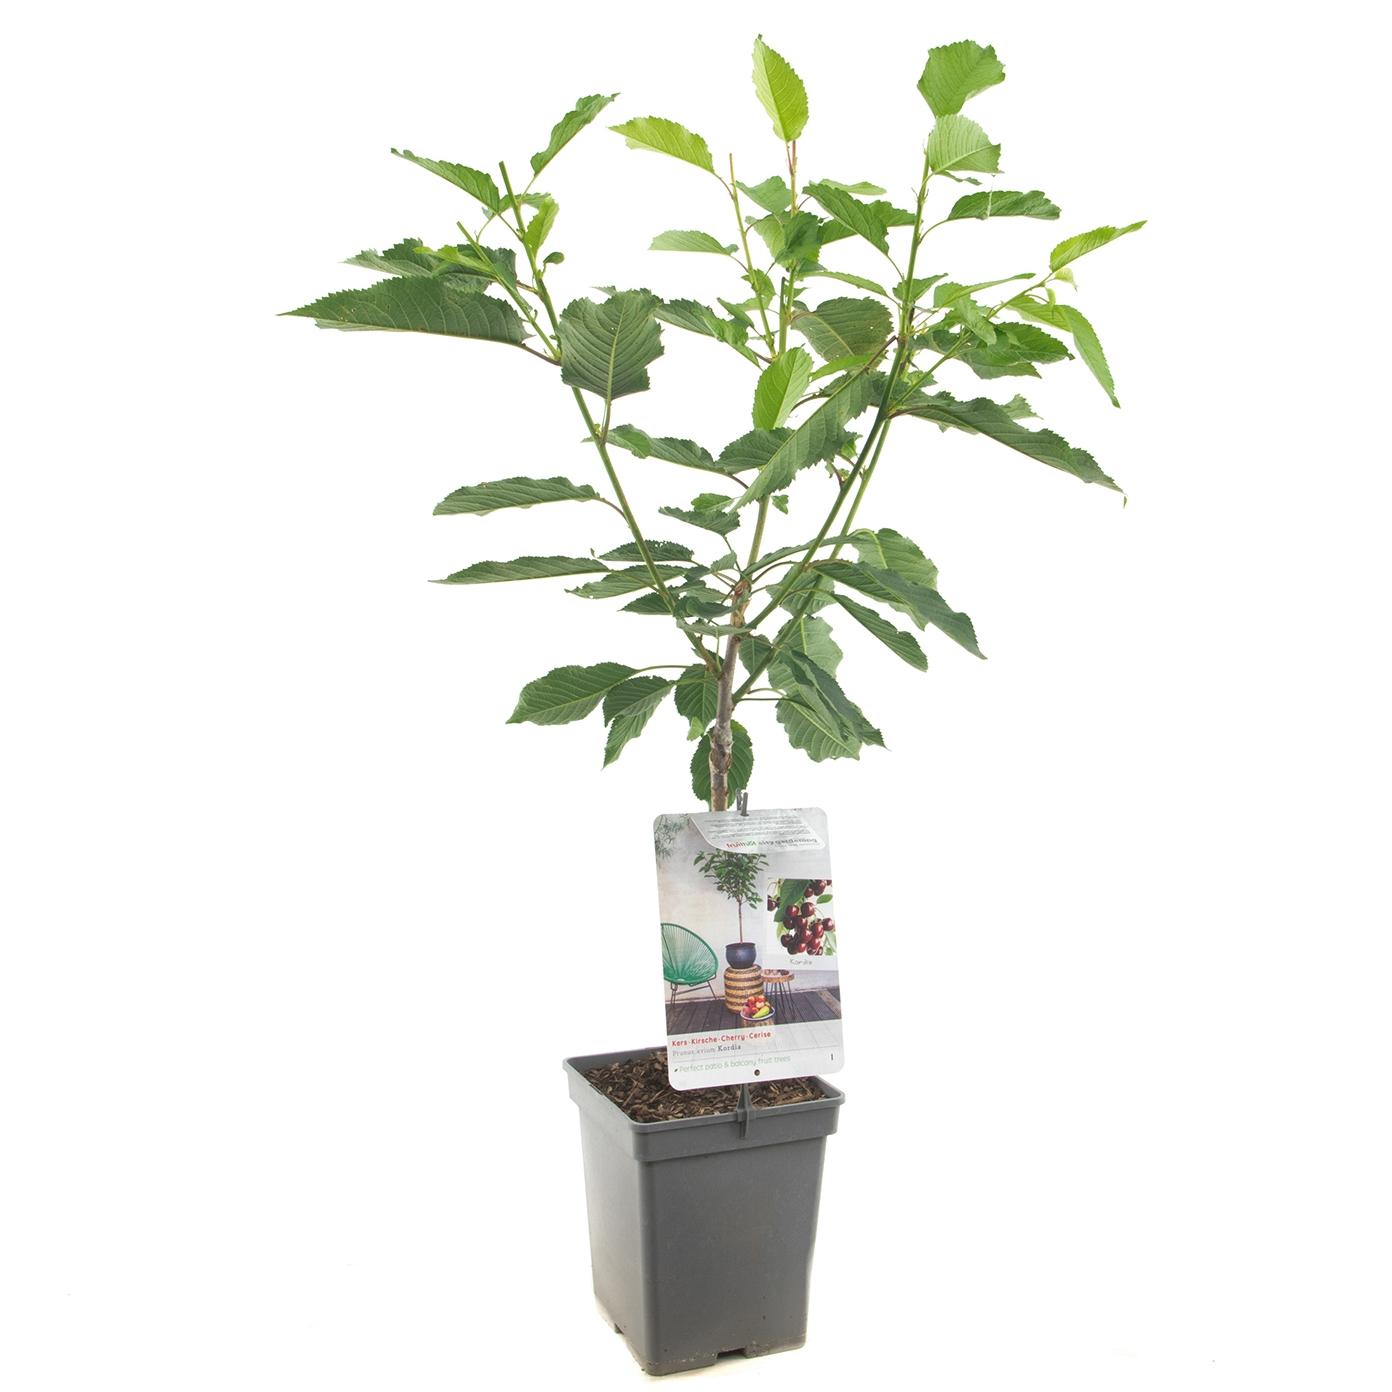 Patio kersenboom Prunus avium 'Kordia'